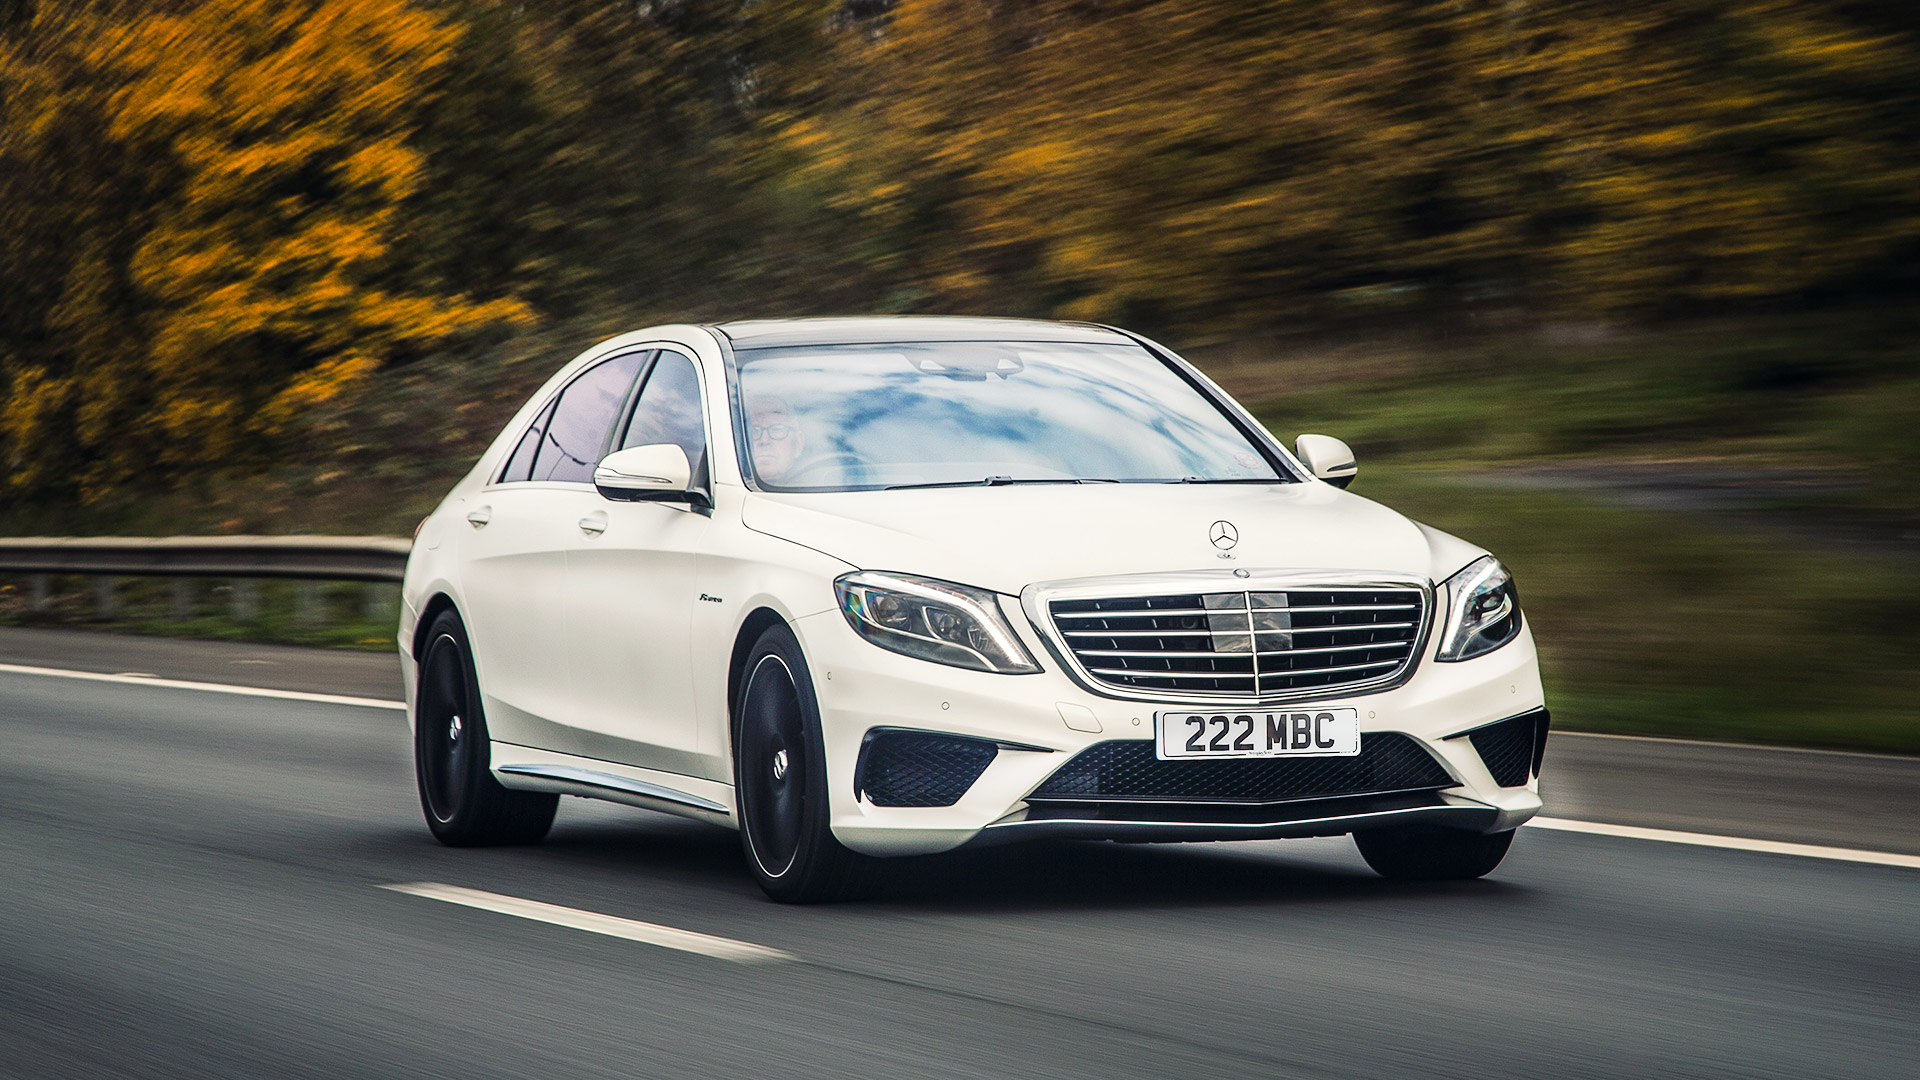 Mercedes benz s class 2018 price mileage reviews for Mercedes benz s class prices